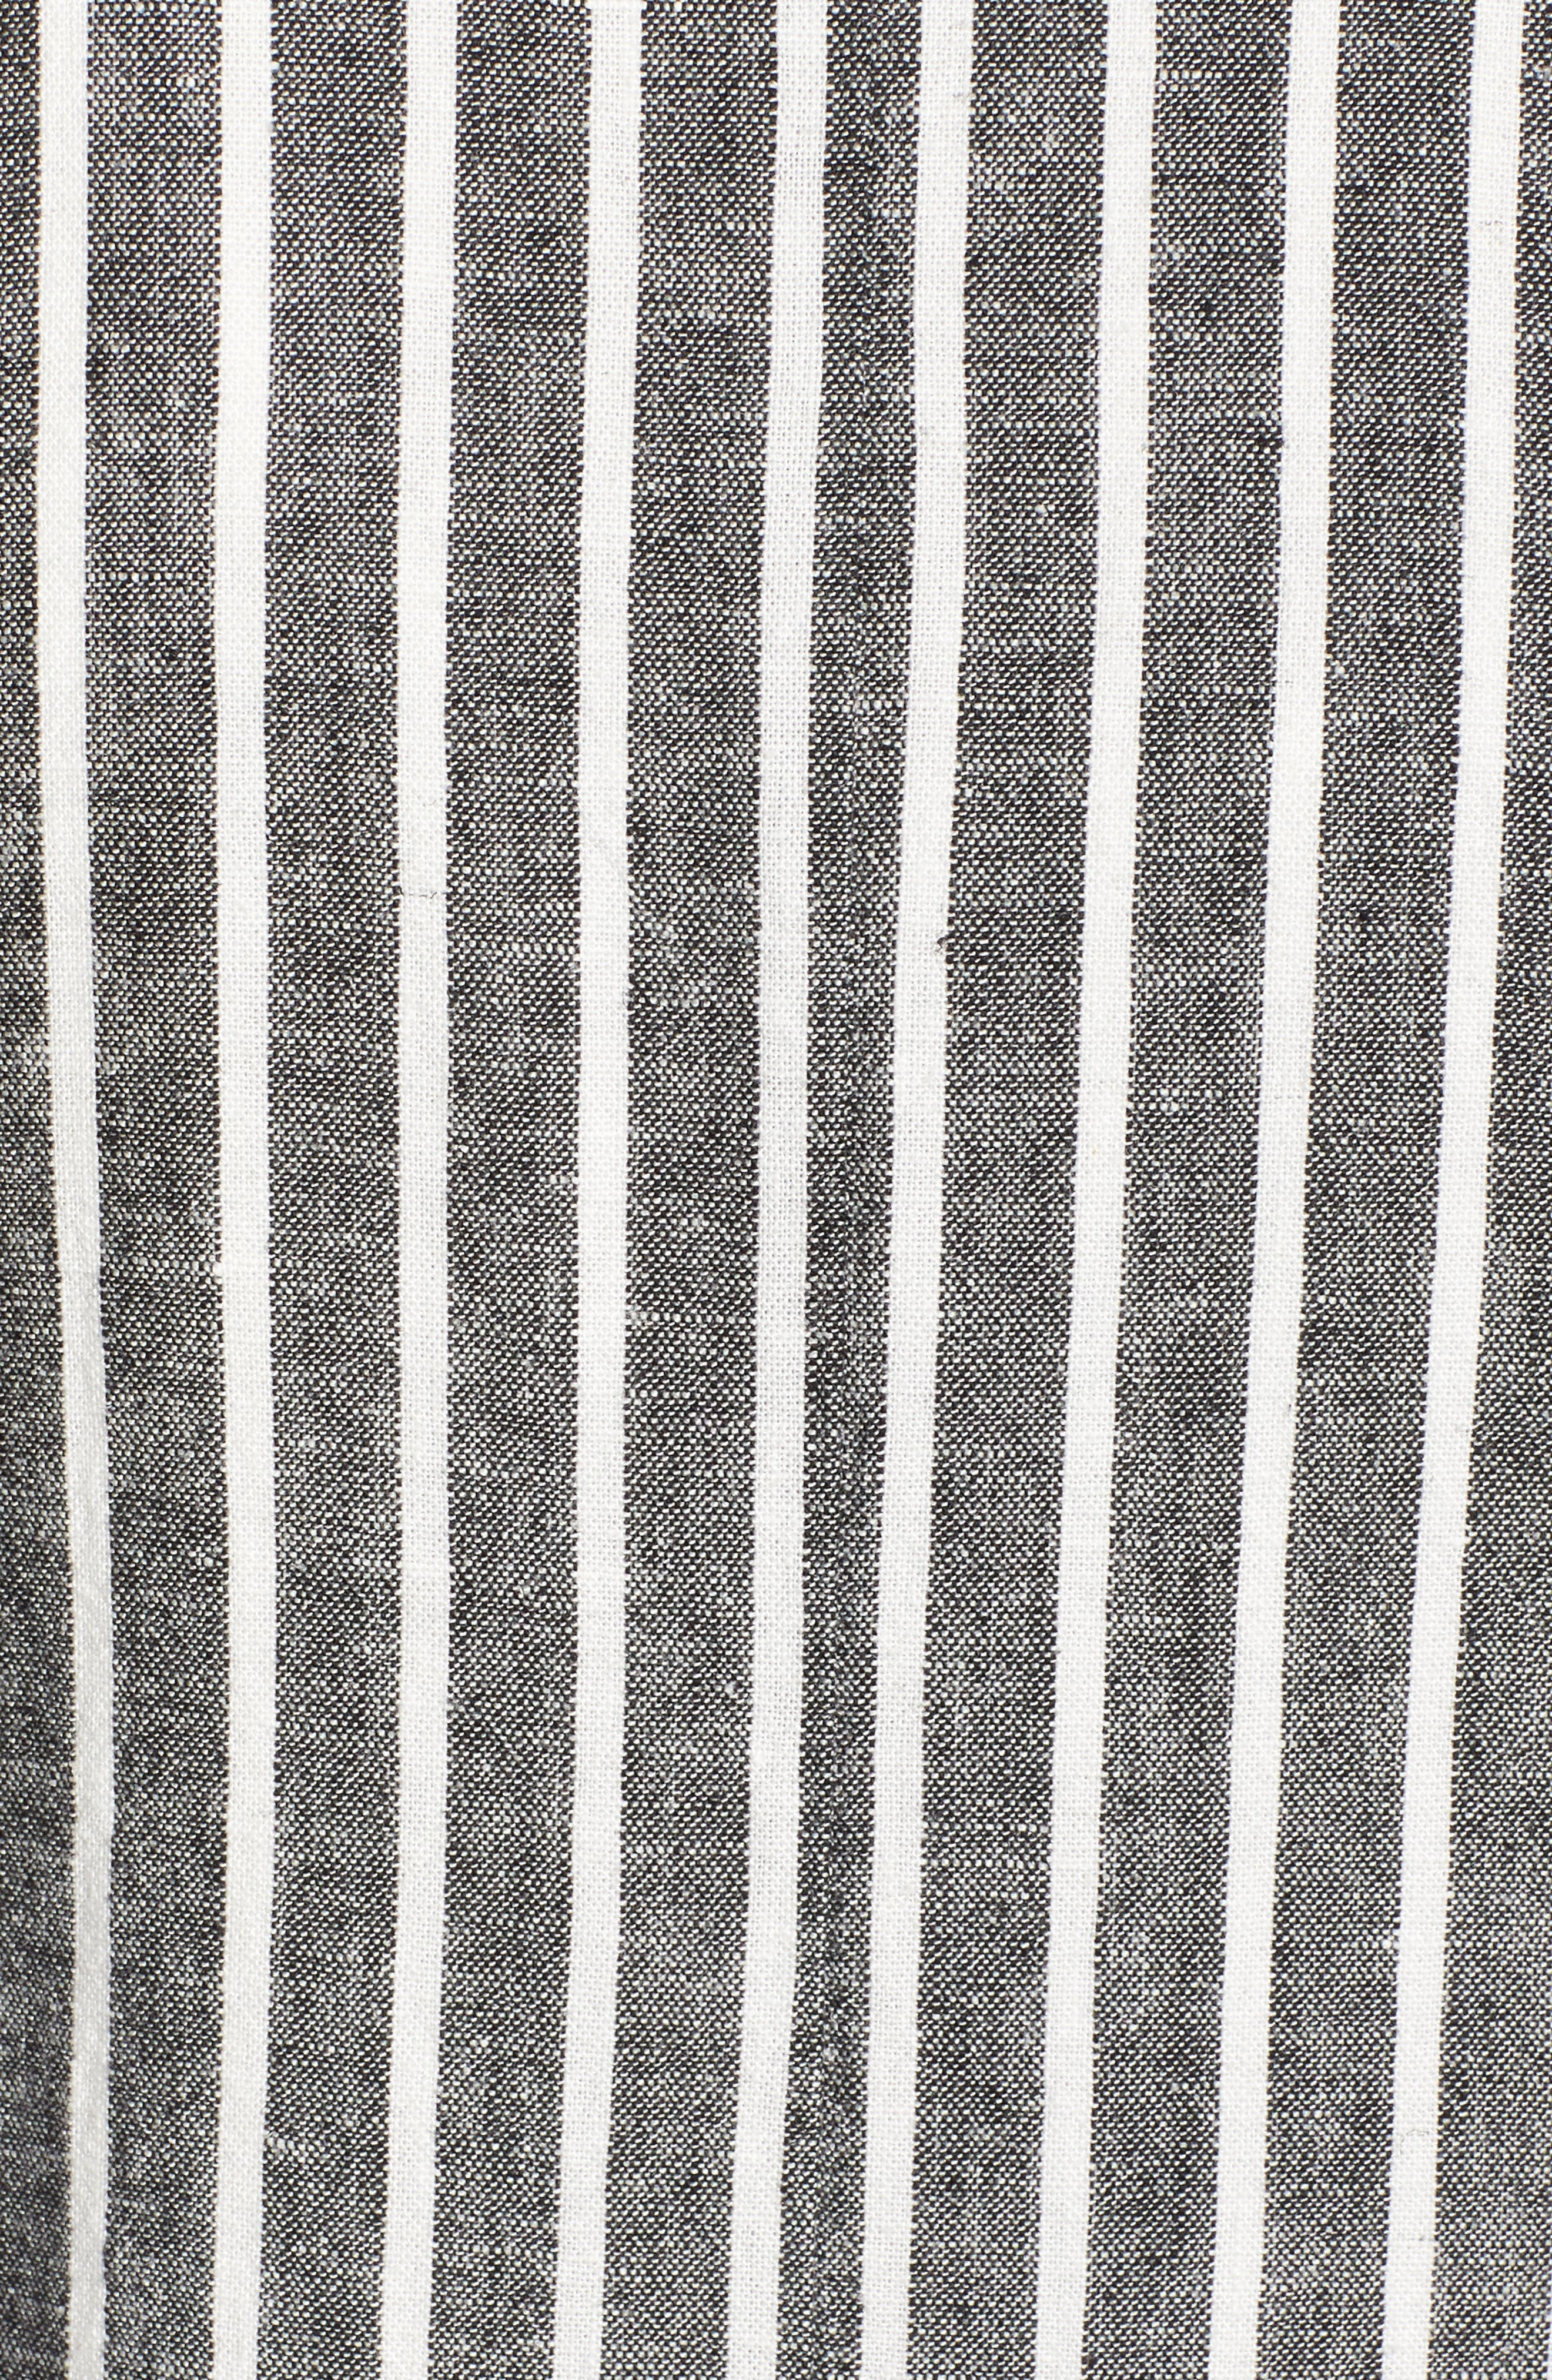 Cinch Sleeve Blazer,                             Alternate thumbnail 5, color,                             001